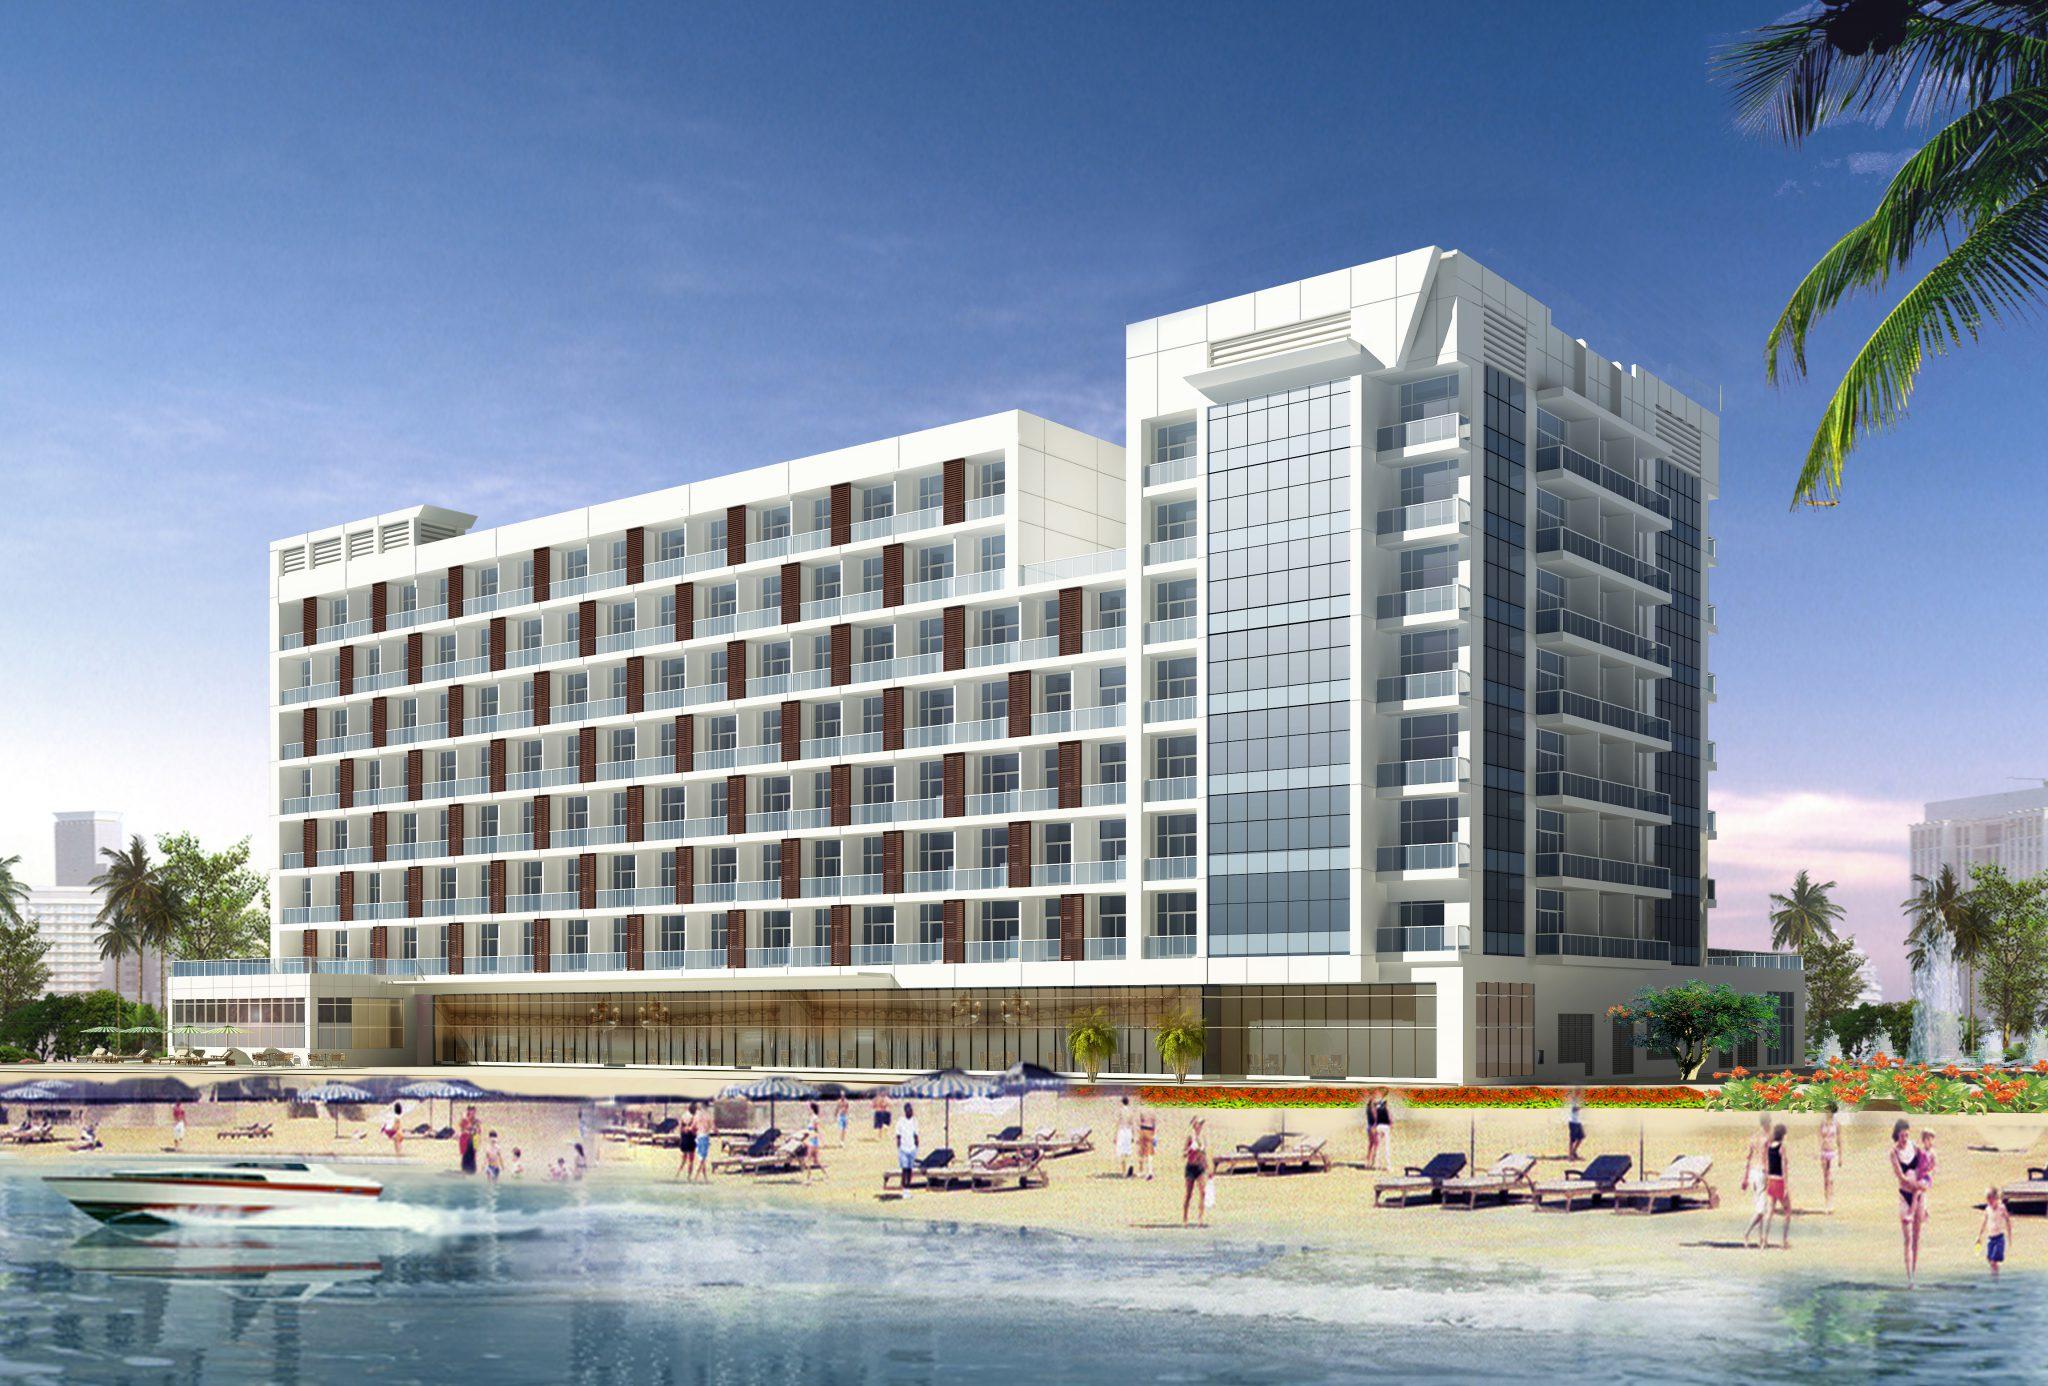 SANTORINI HOTEL- RAS AL KHAIMAH,U.A.E